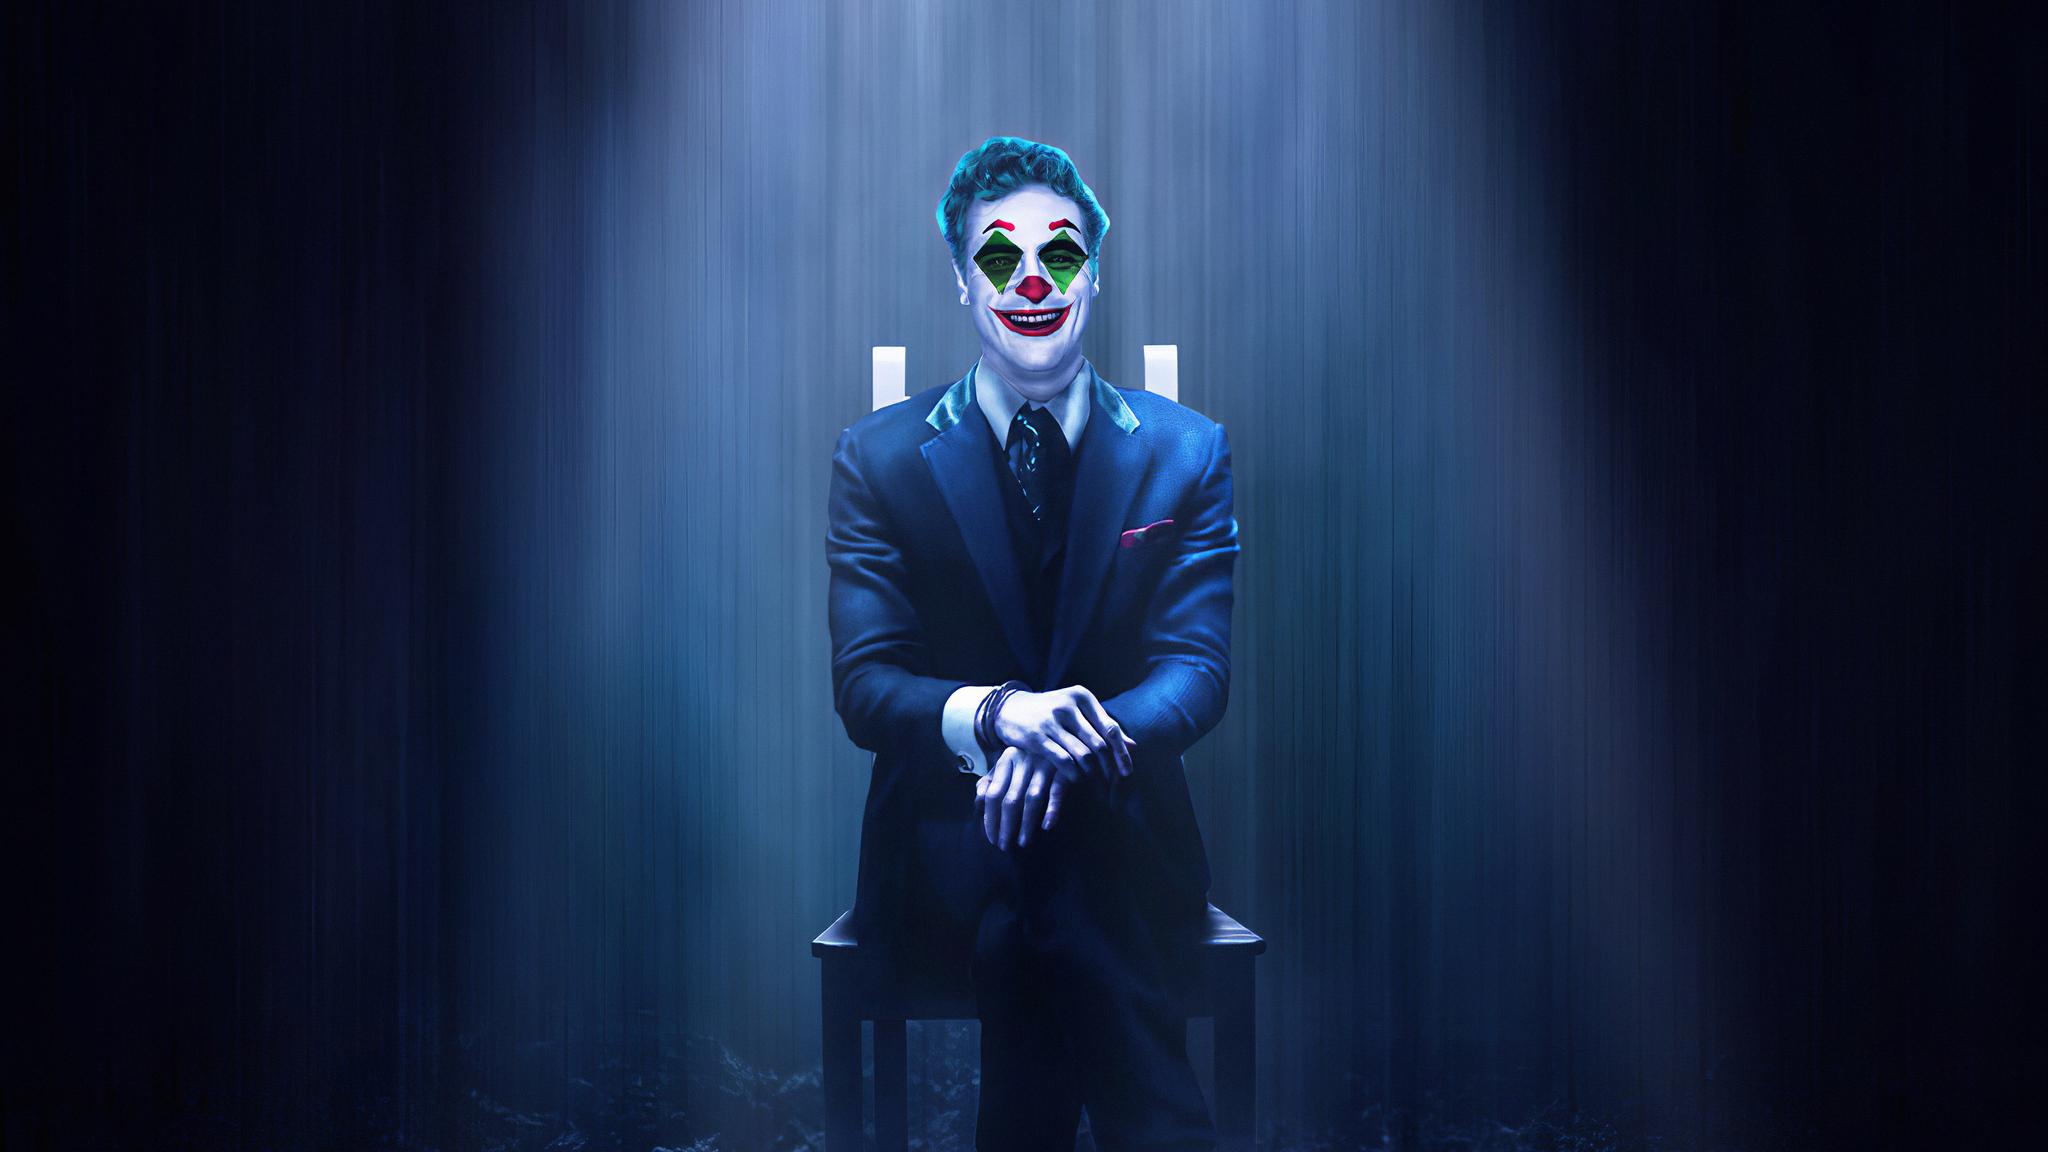 joker-sitting-on-chair-uh.jpg